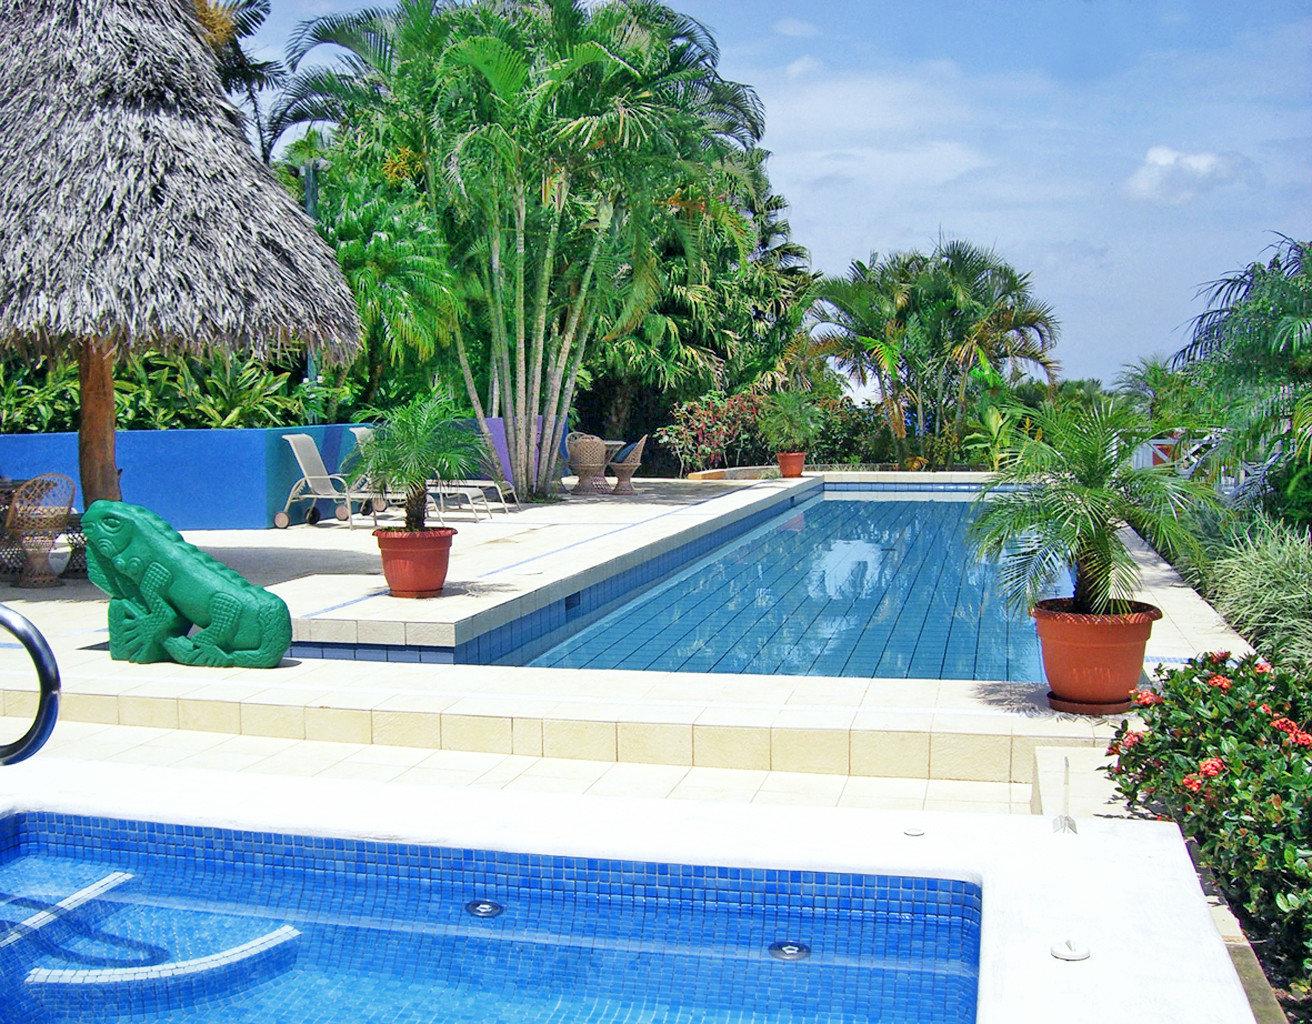 Hot tub Hot tub/Jacuzzi Outdoors Pool Scenic views Wellness tree swimming pool property leisure Resort Villa backyard reflecting pool condominium